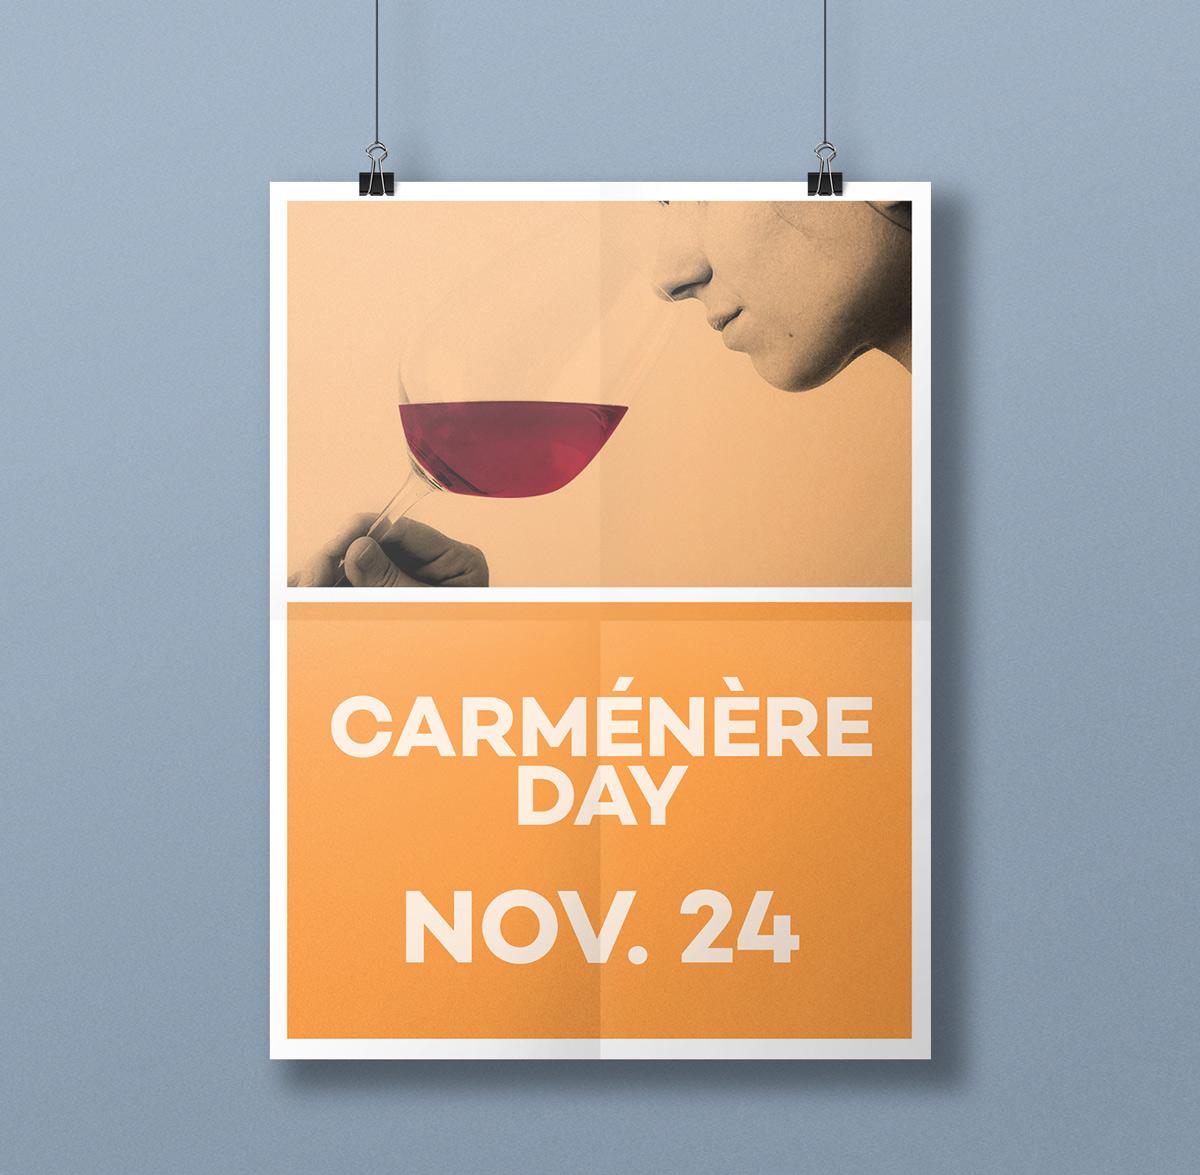 Carmenere-Day-November-24